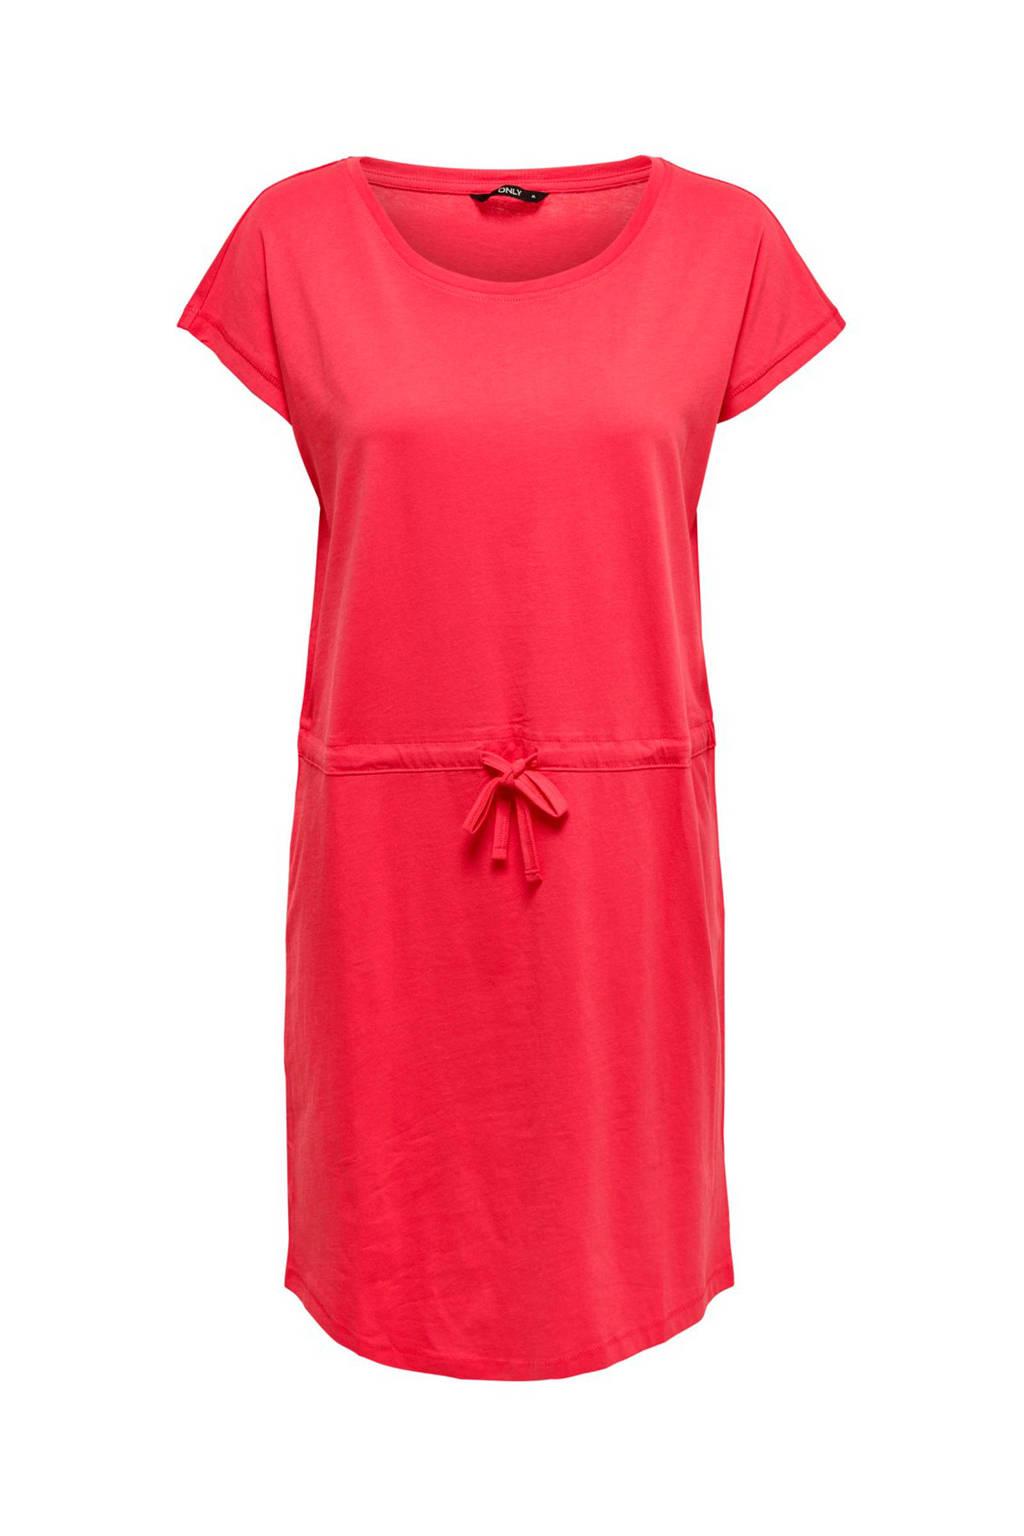 ONLY jurk met striksluiting, Roze